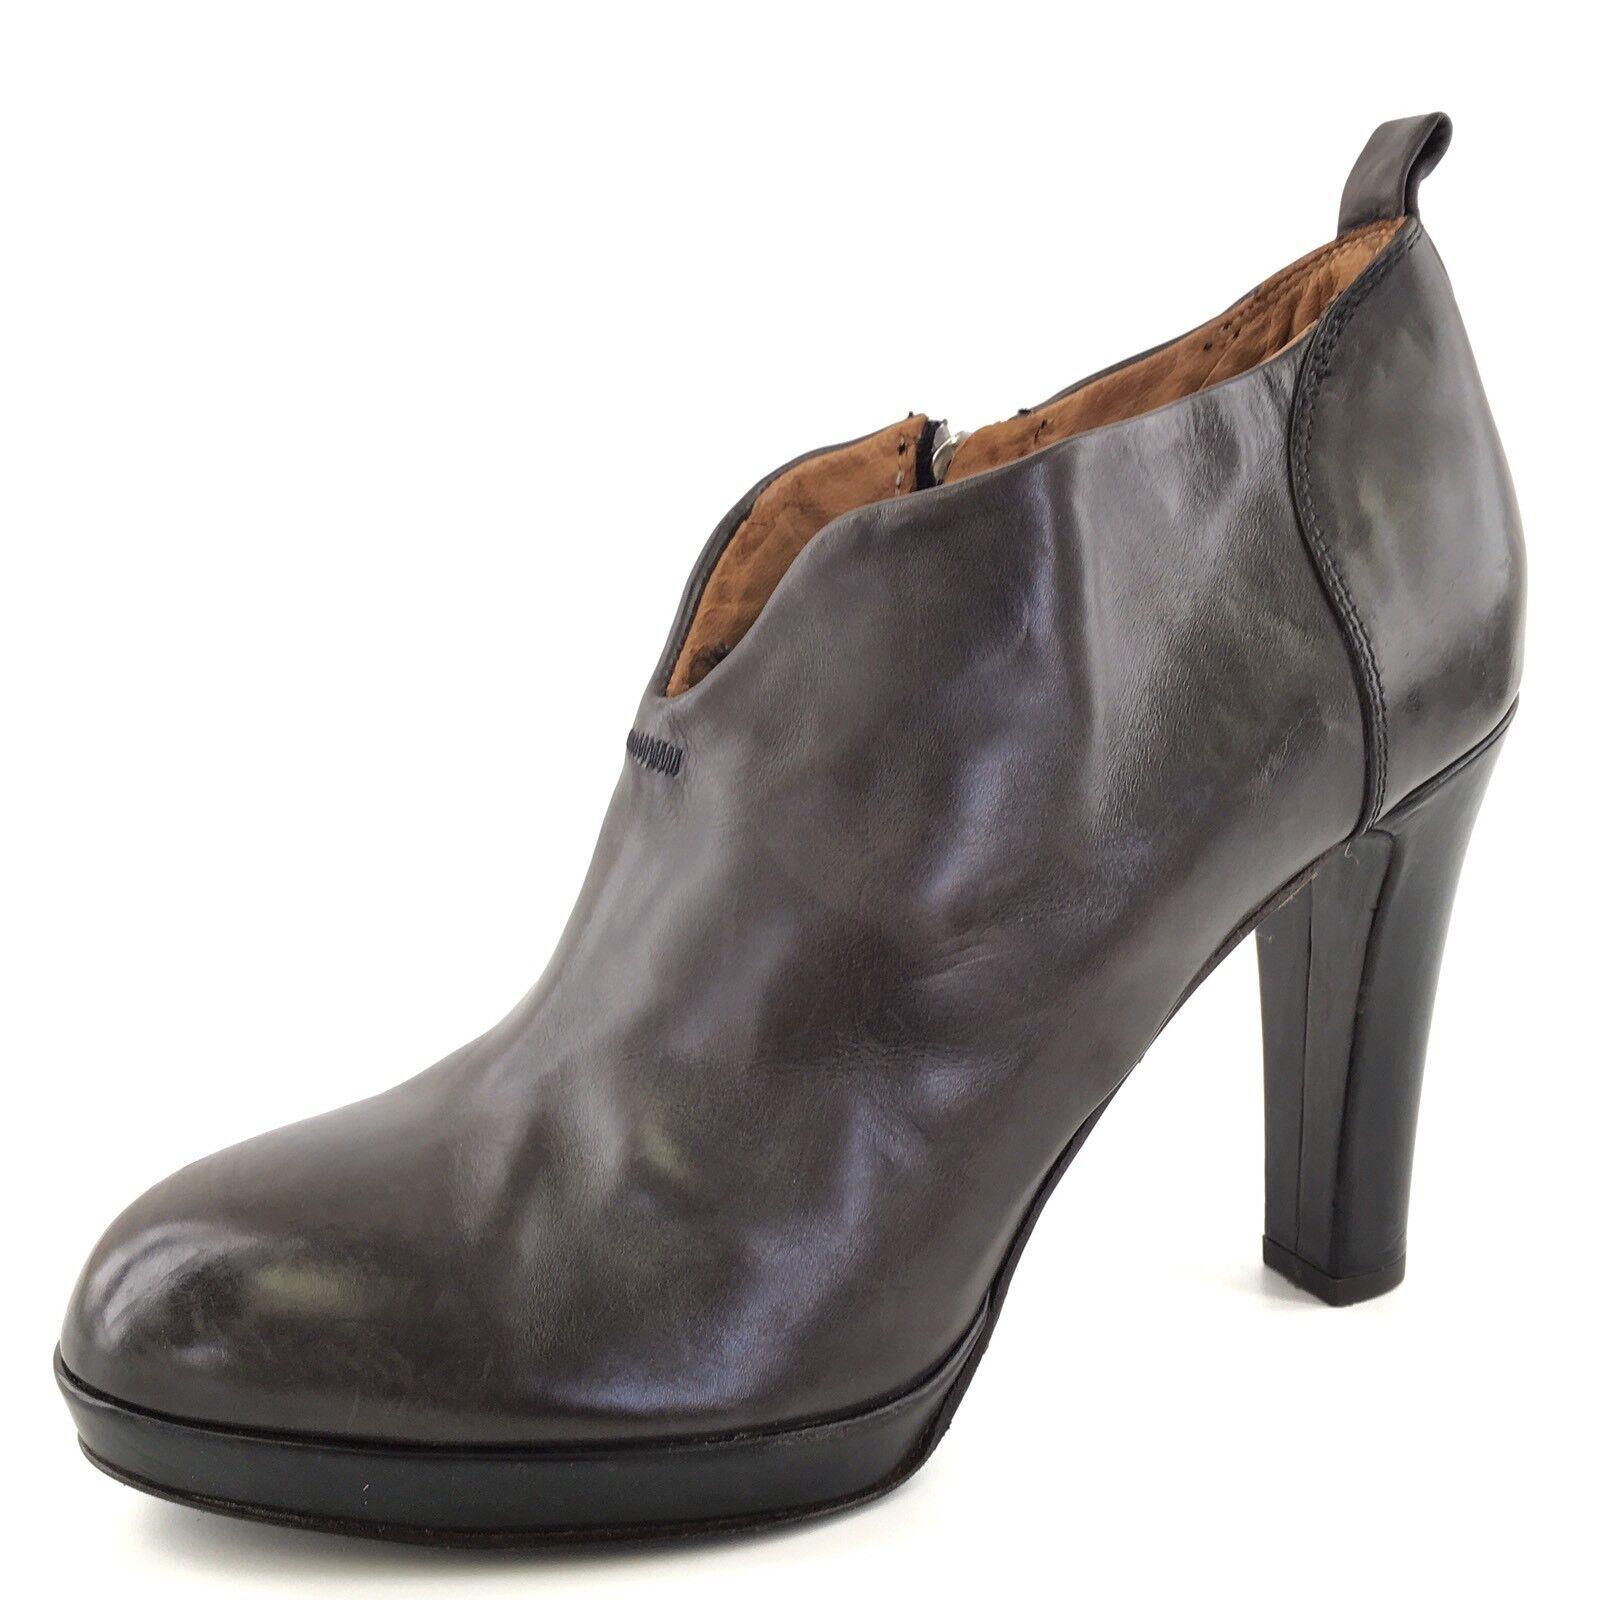 New Alberto Fermani Brown Pelle Ankle Stivali Donna Size 10 M RP  515*